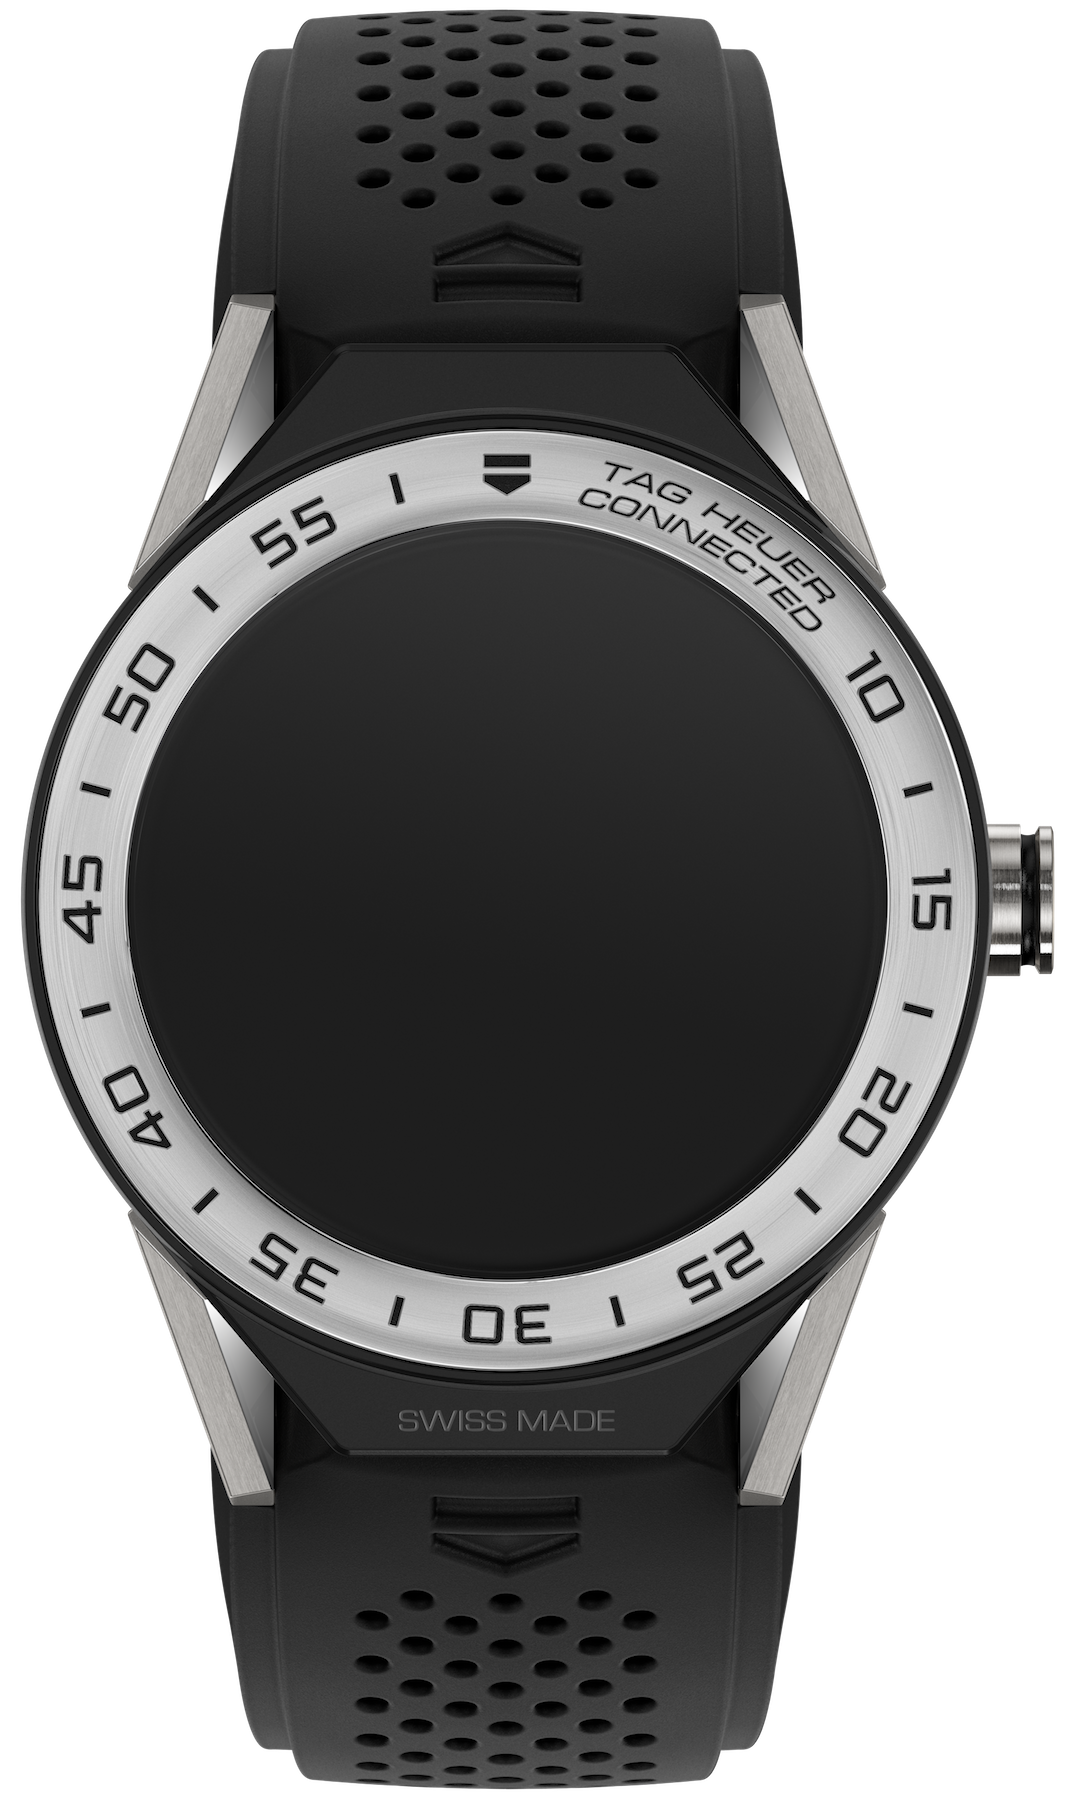 Seiko Astron Watch GPS Solar Watch  SAST023G Watch